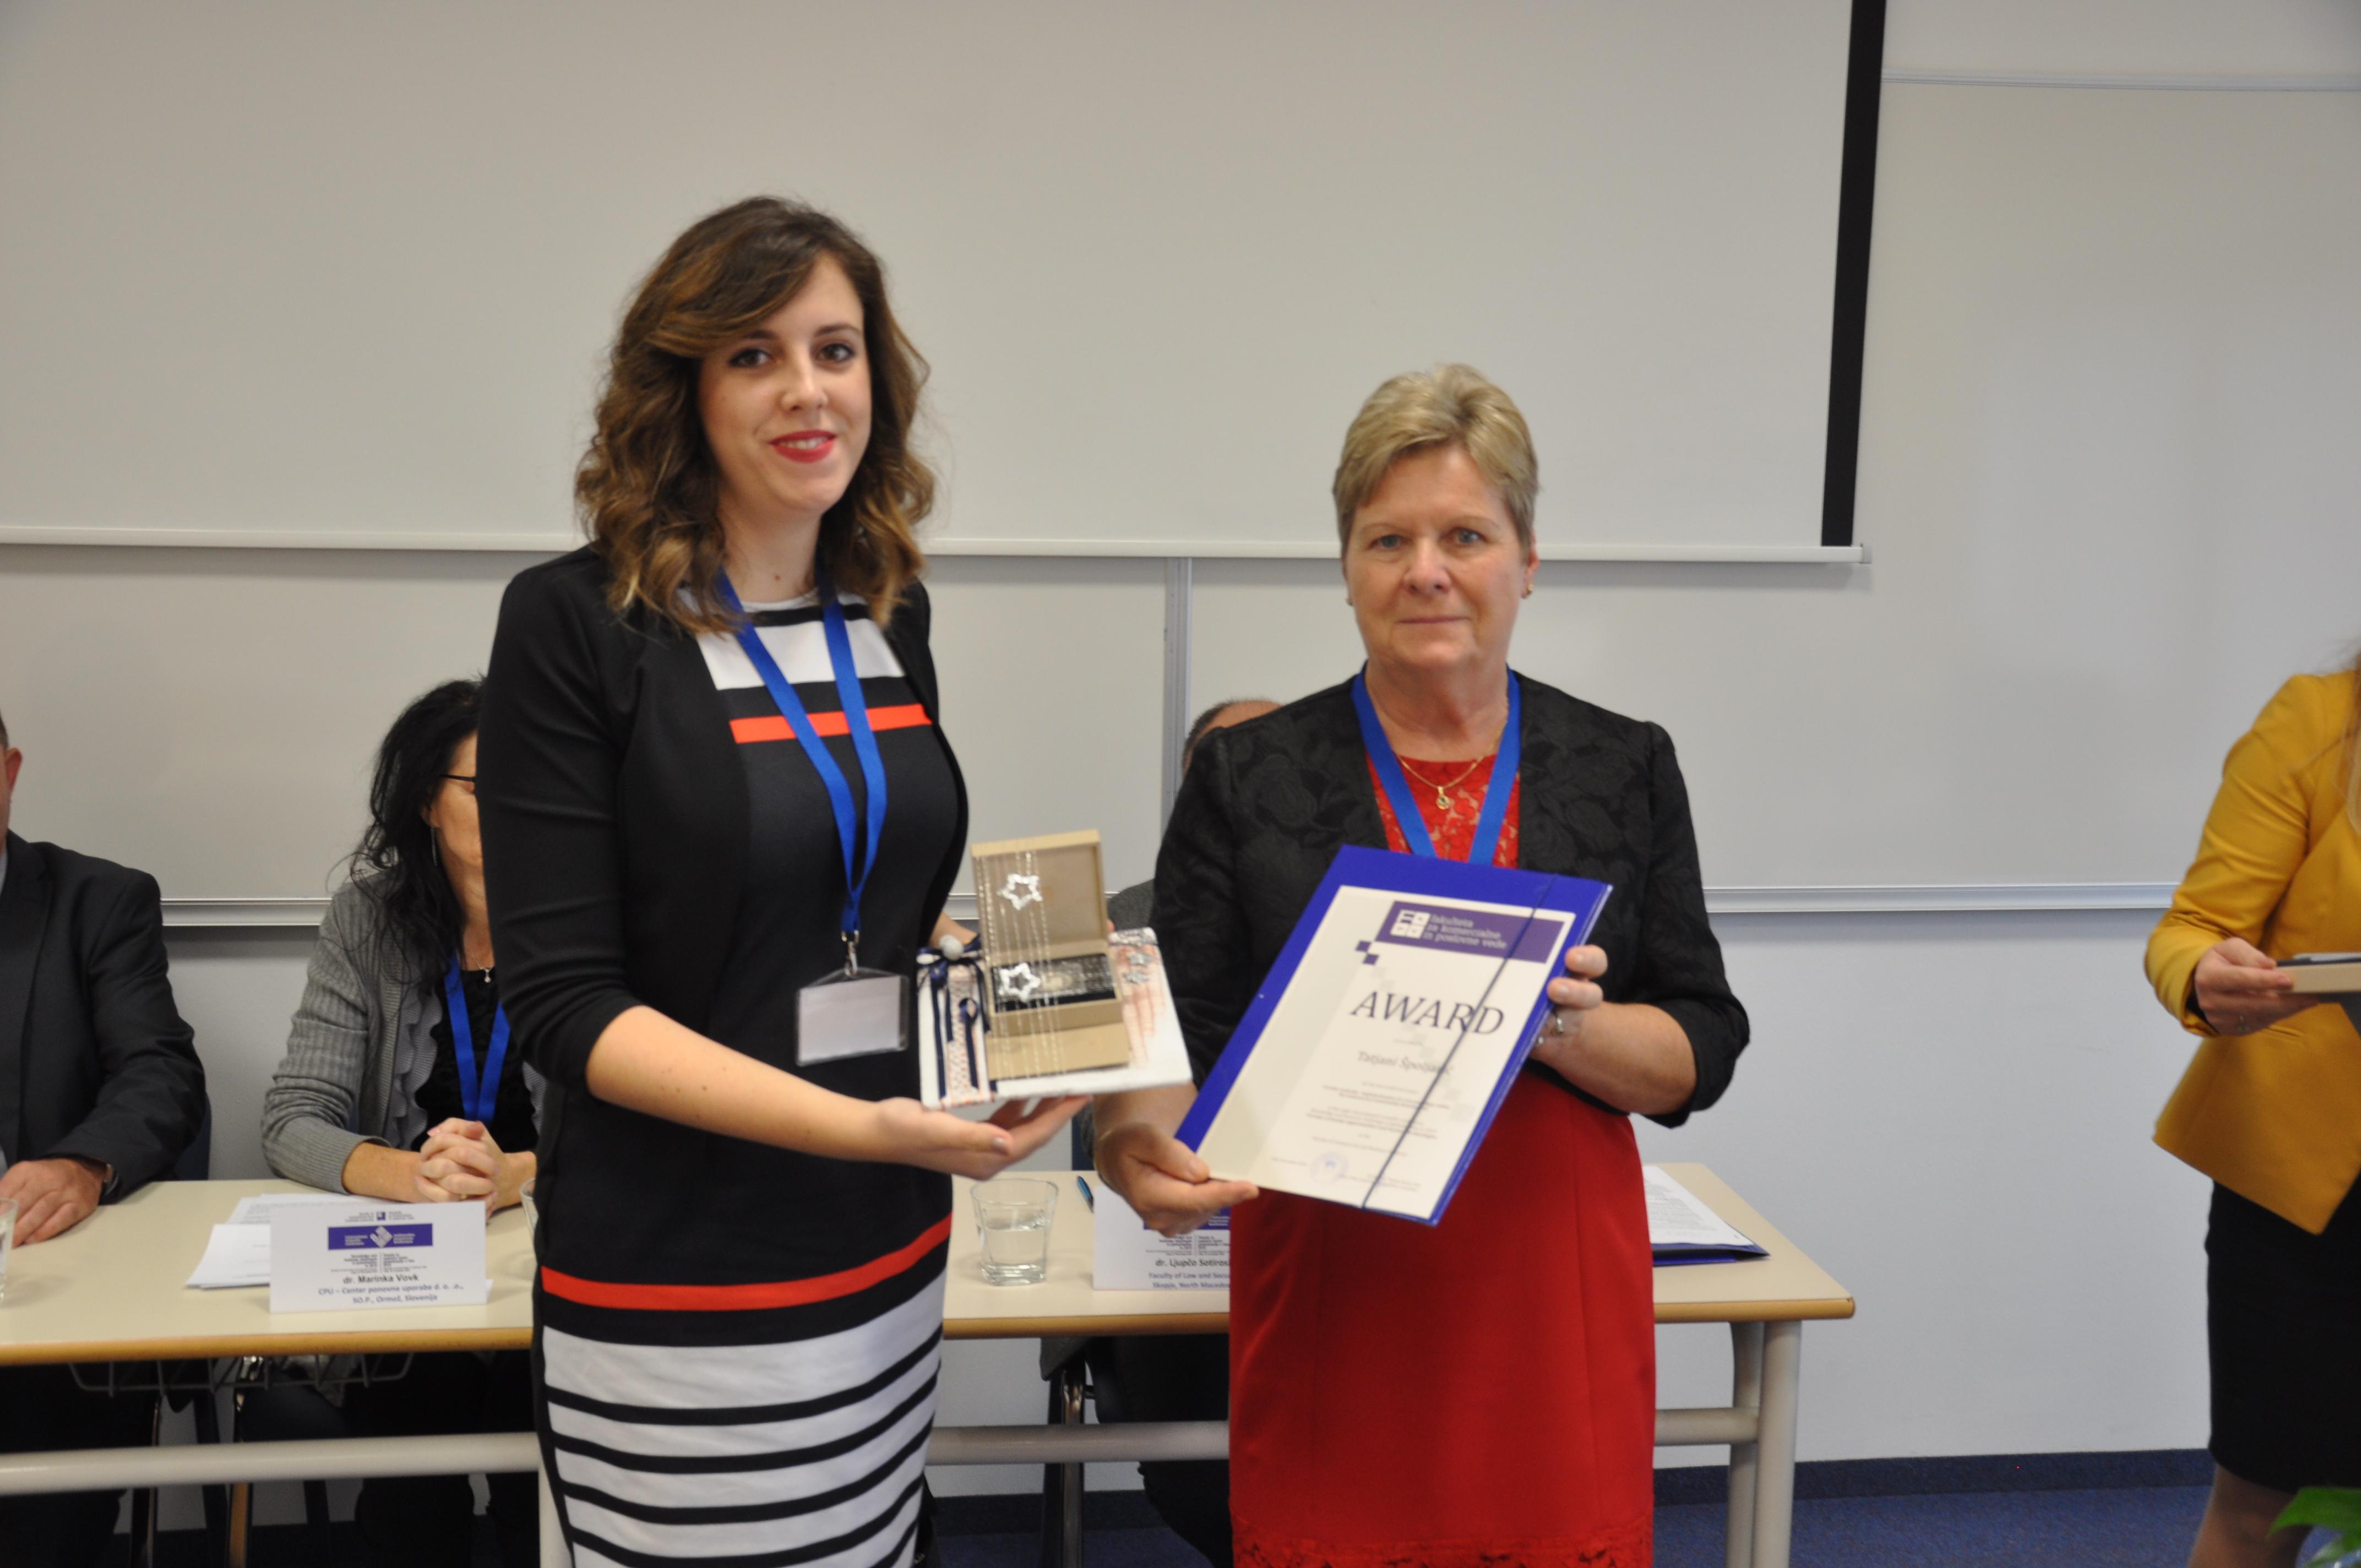 Priznanje za najboljši članek konference je prejela Tatjana Špoljarić, mag. s prispevkom Kružno gospodarstvo – implementacija nove paradigme u okviru održivog razvoja